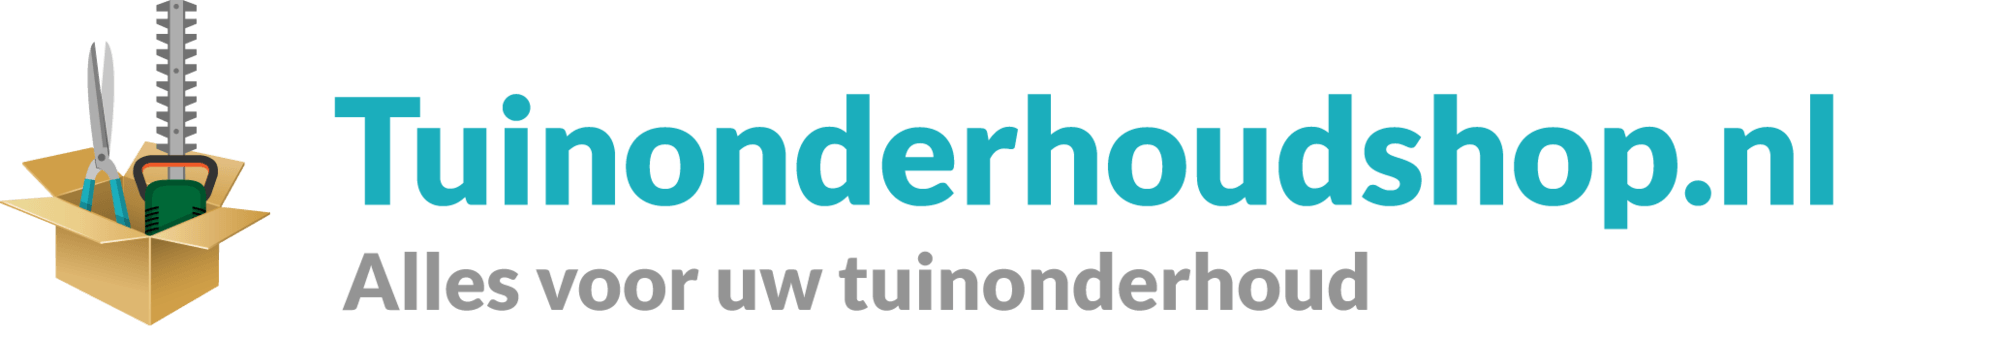 tuinonderhoudshop logo